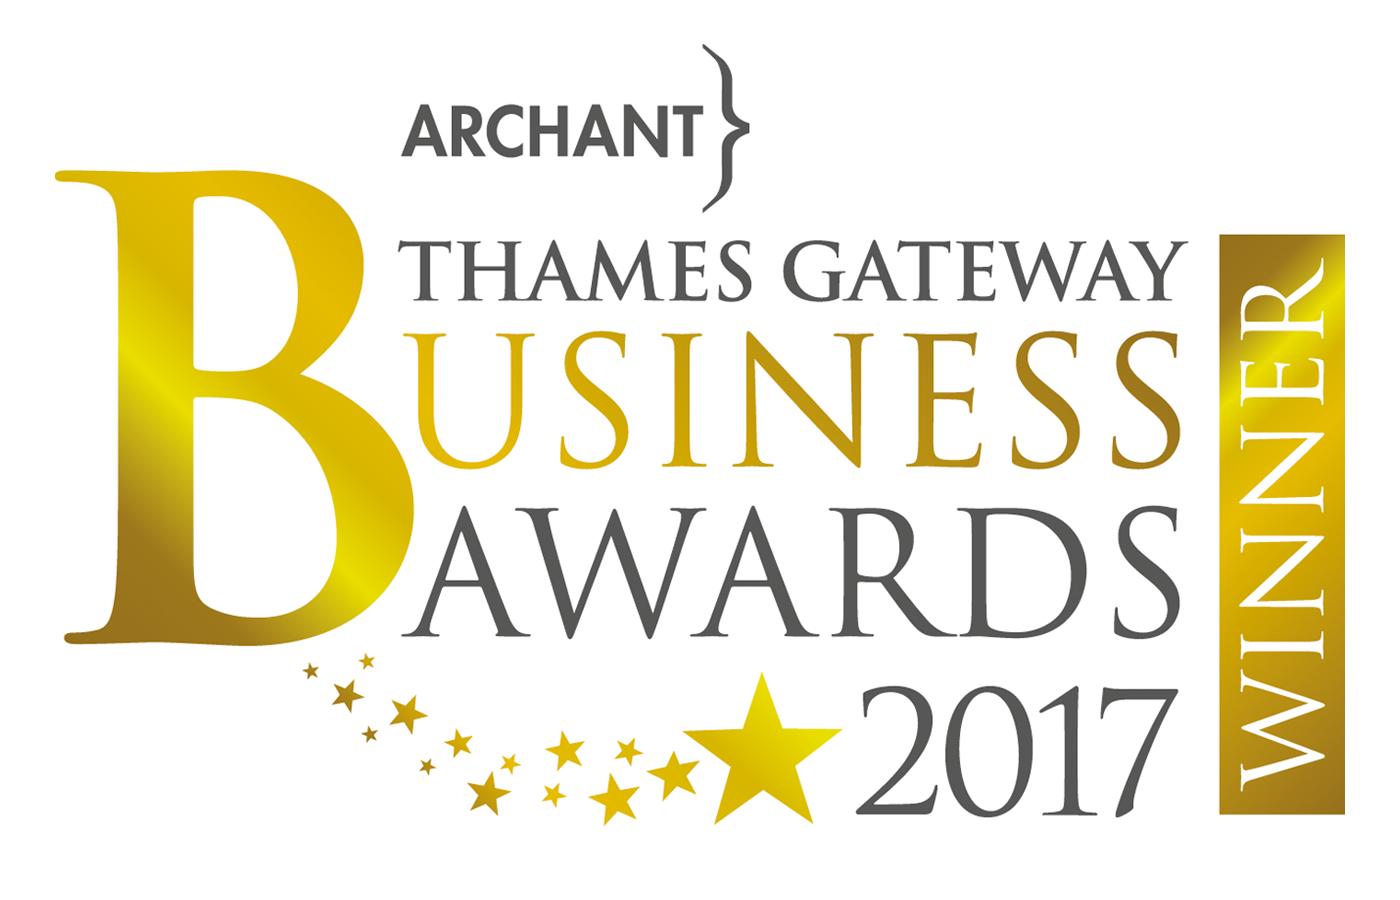 Archant Business Award